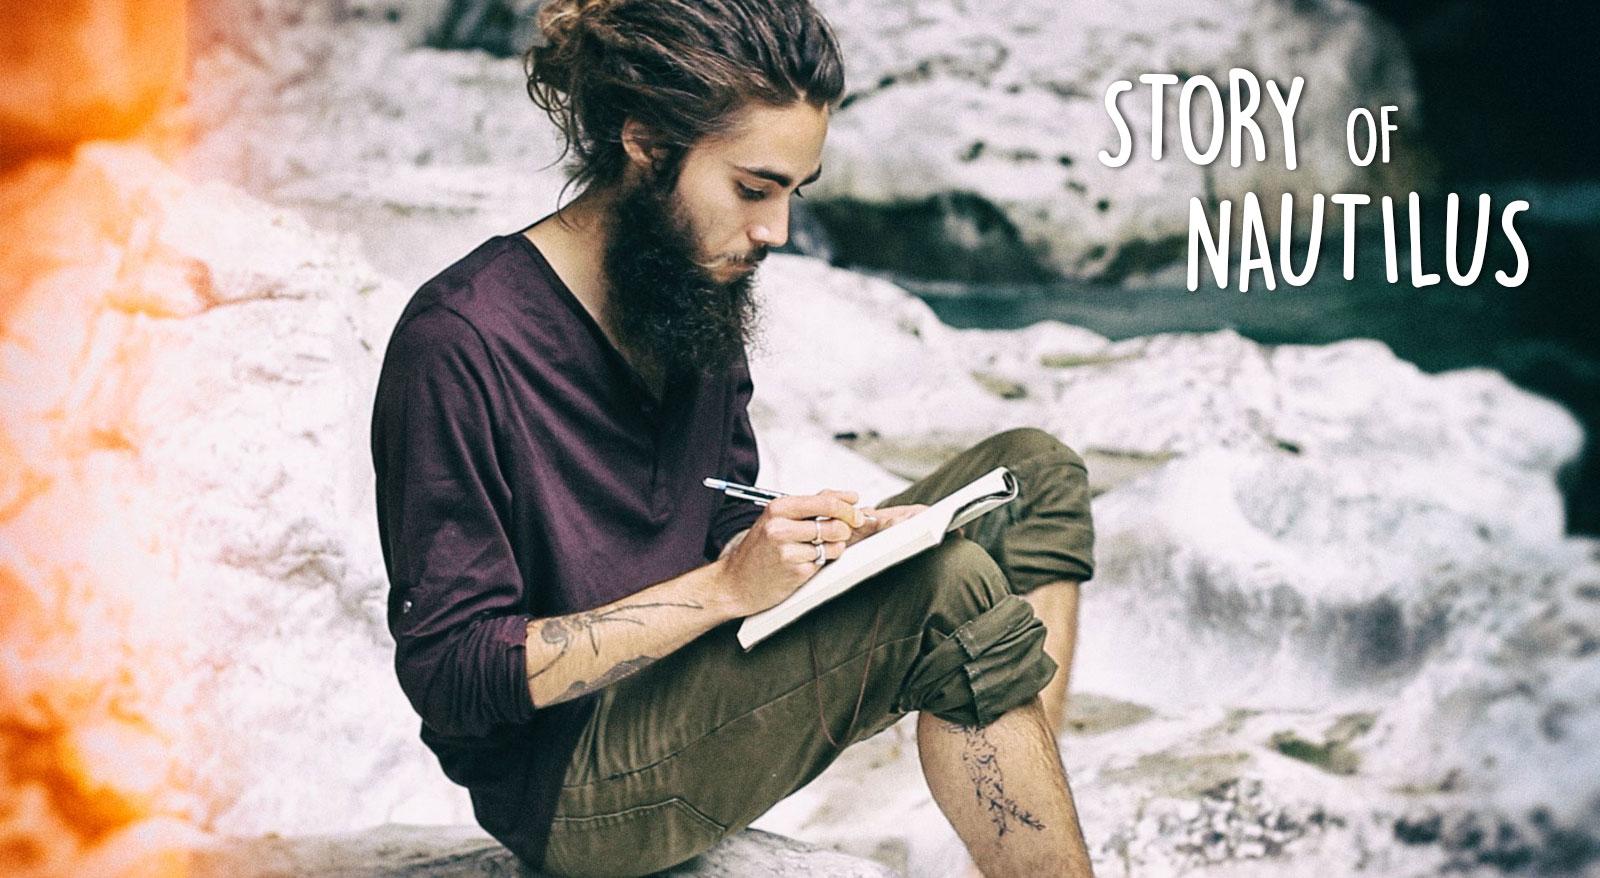 Story of Nautilus - Deeman